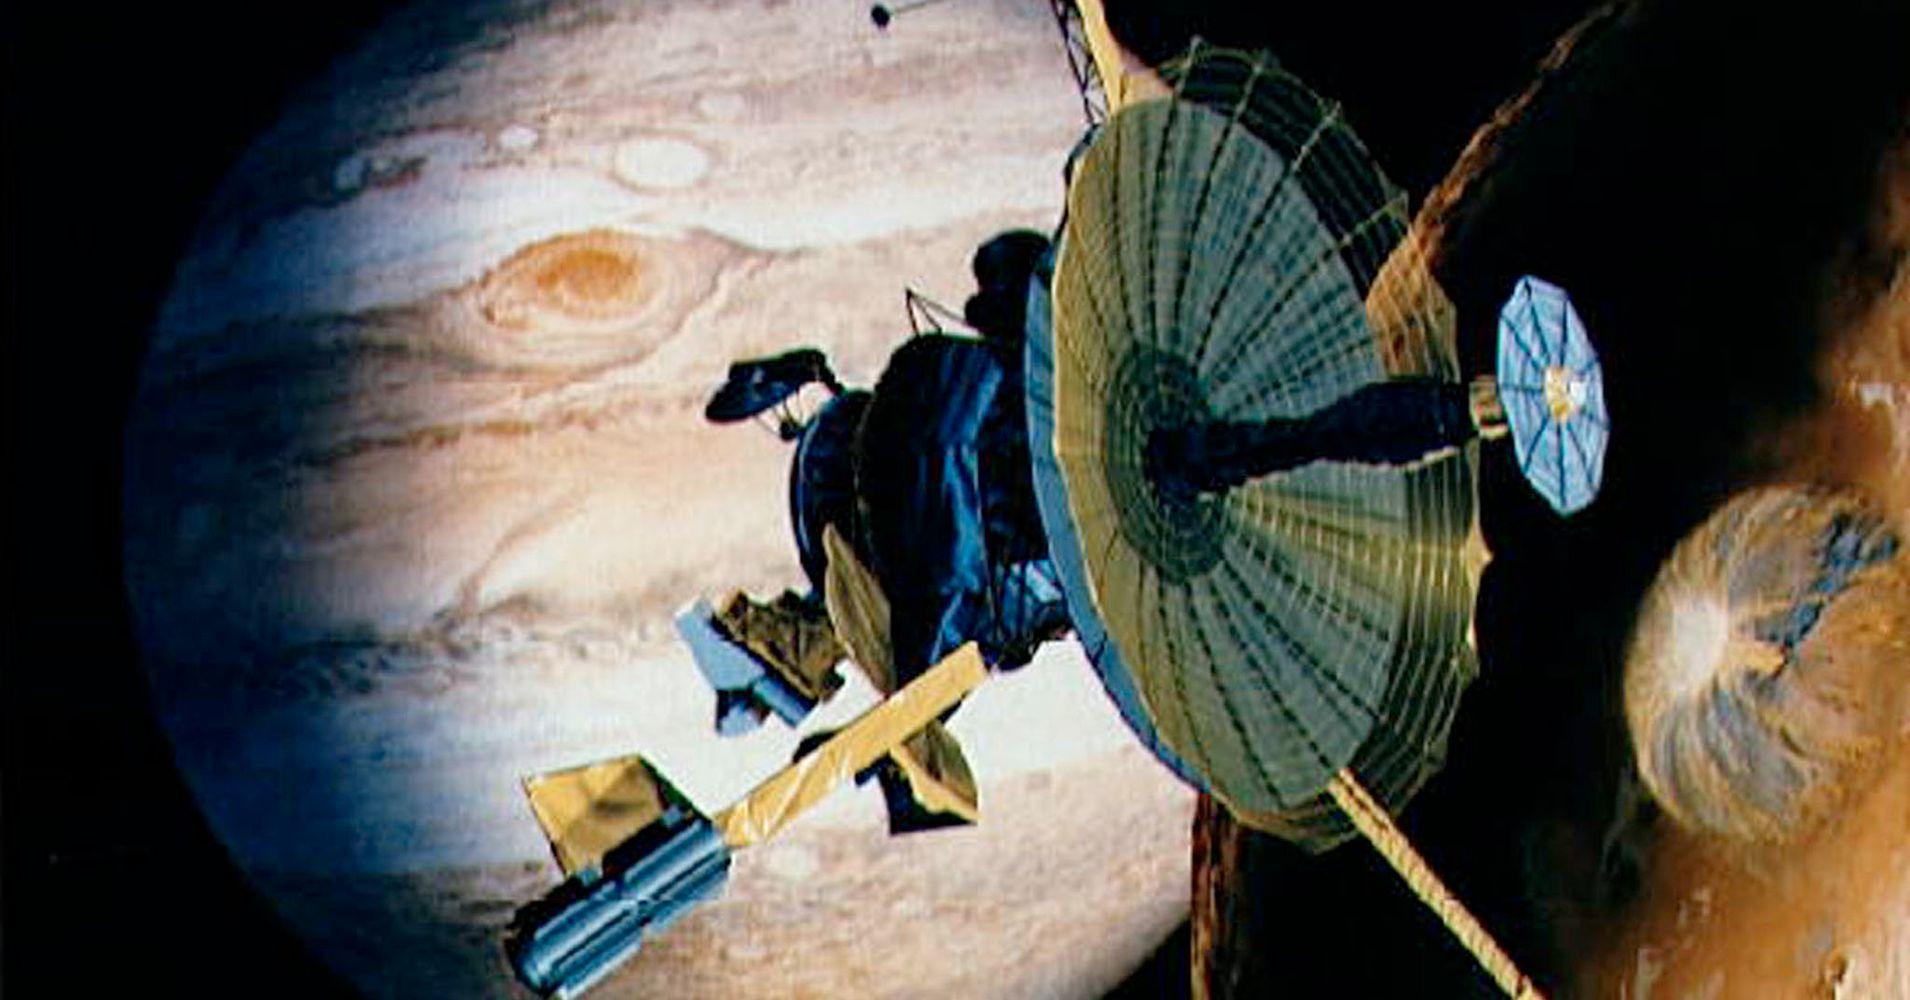 nasa galileo spacecraft - HD1333×1000